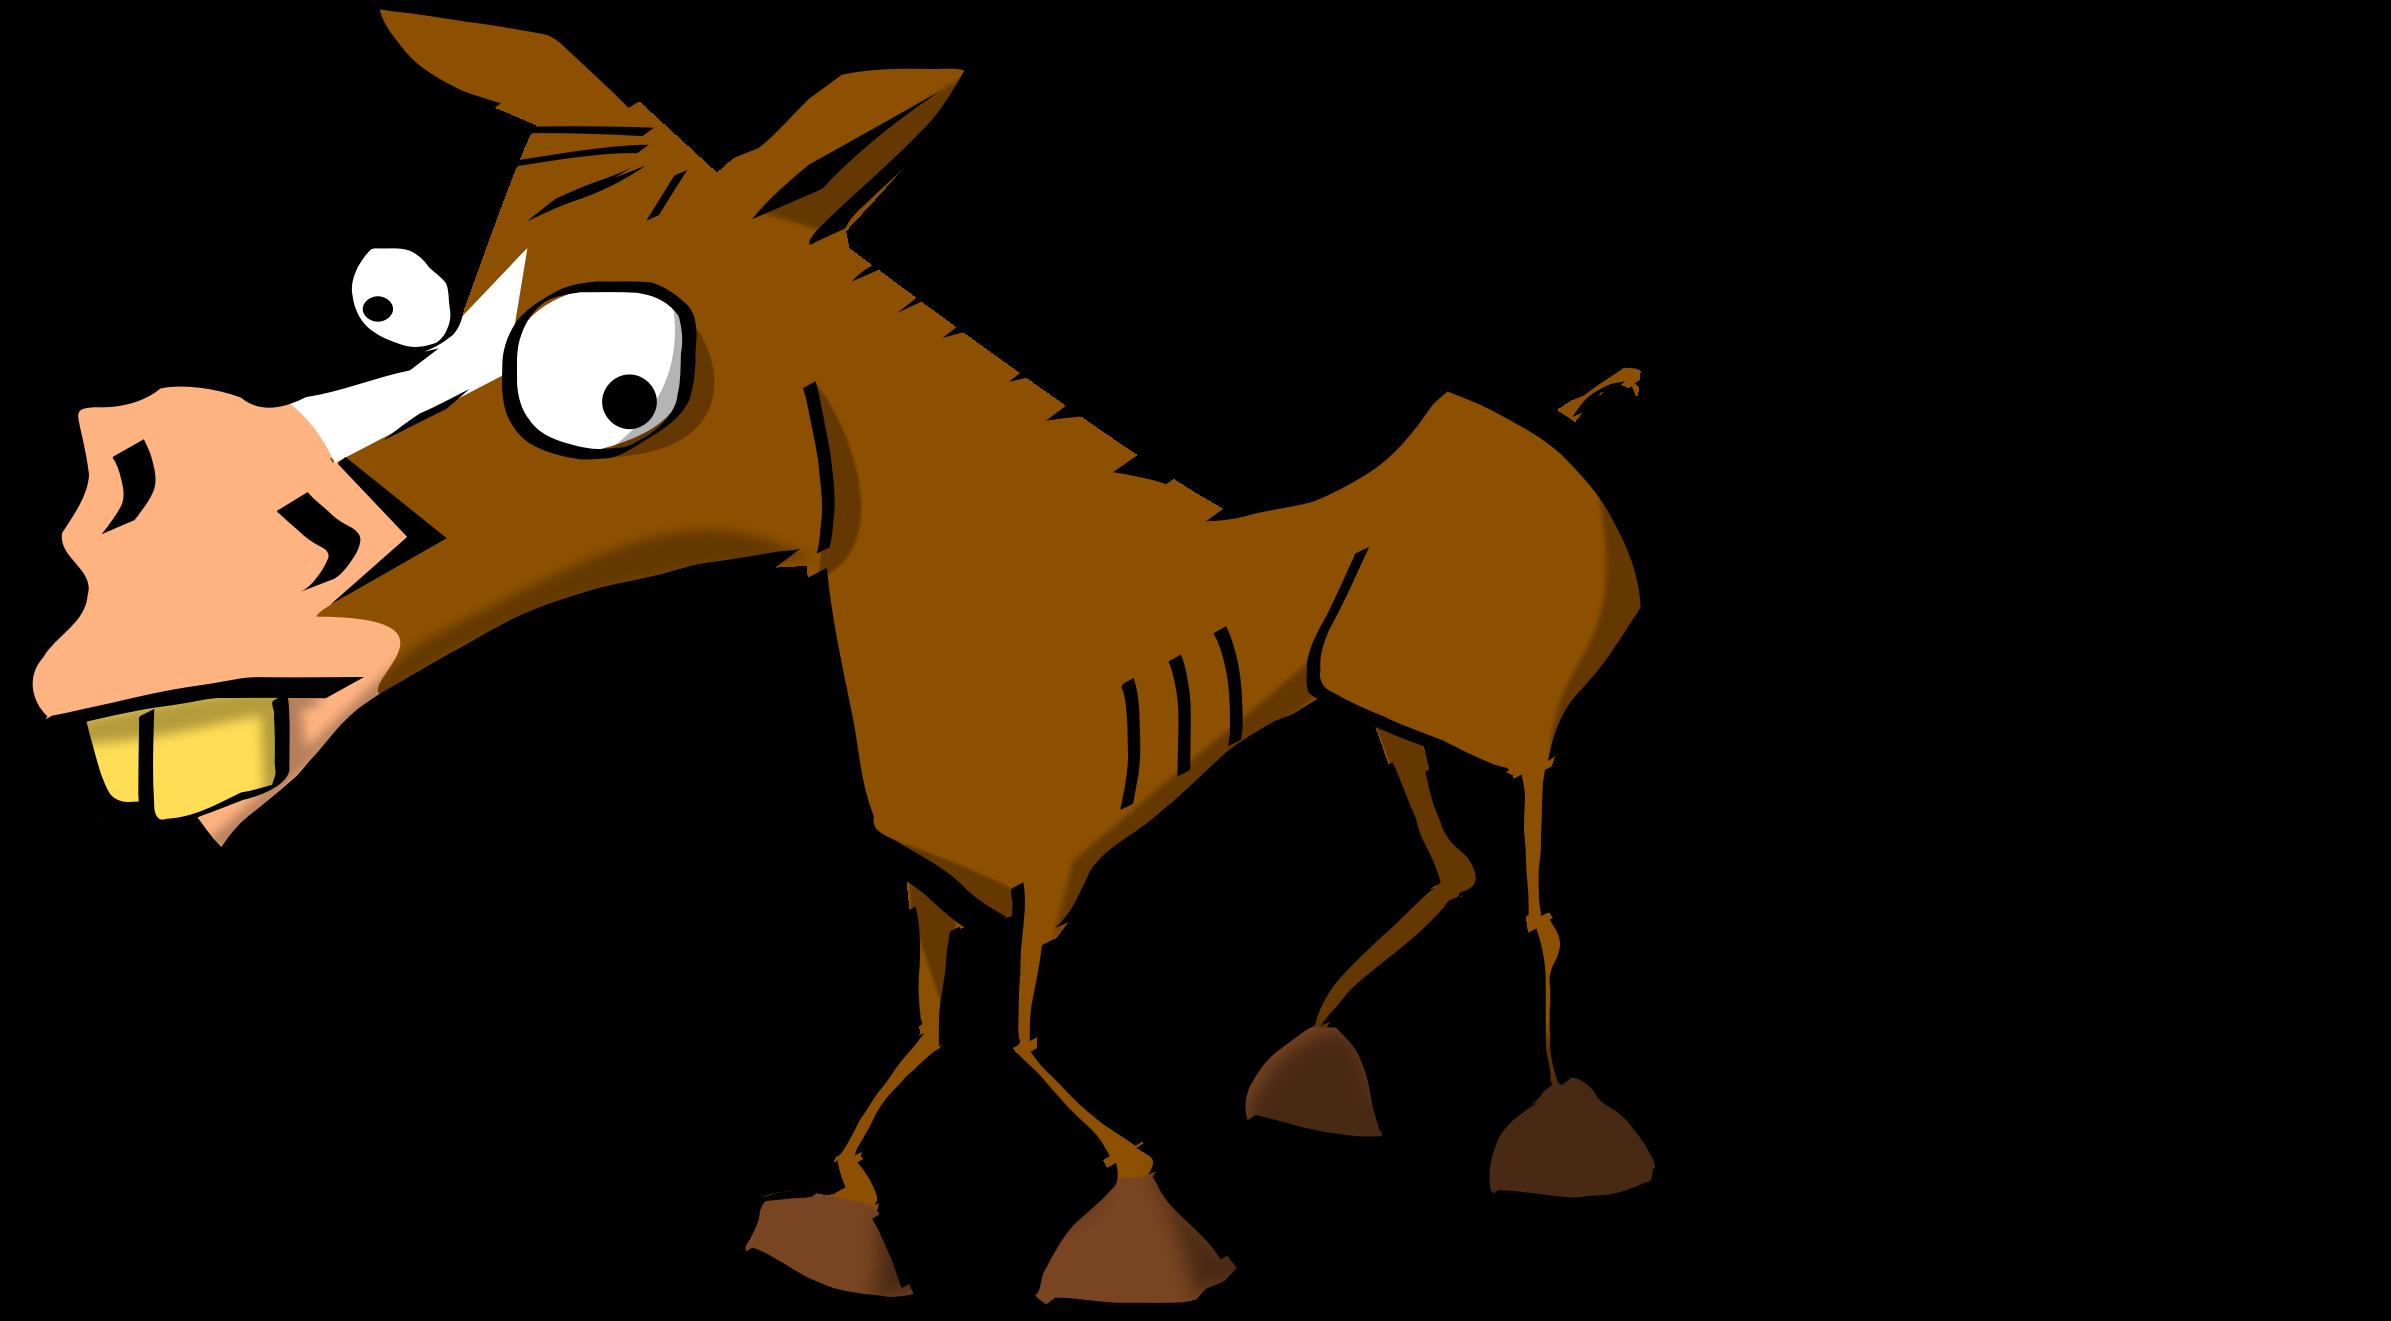 Horse clipart pretty horse. Crazy colored big image